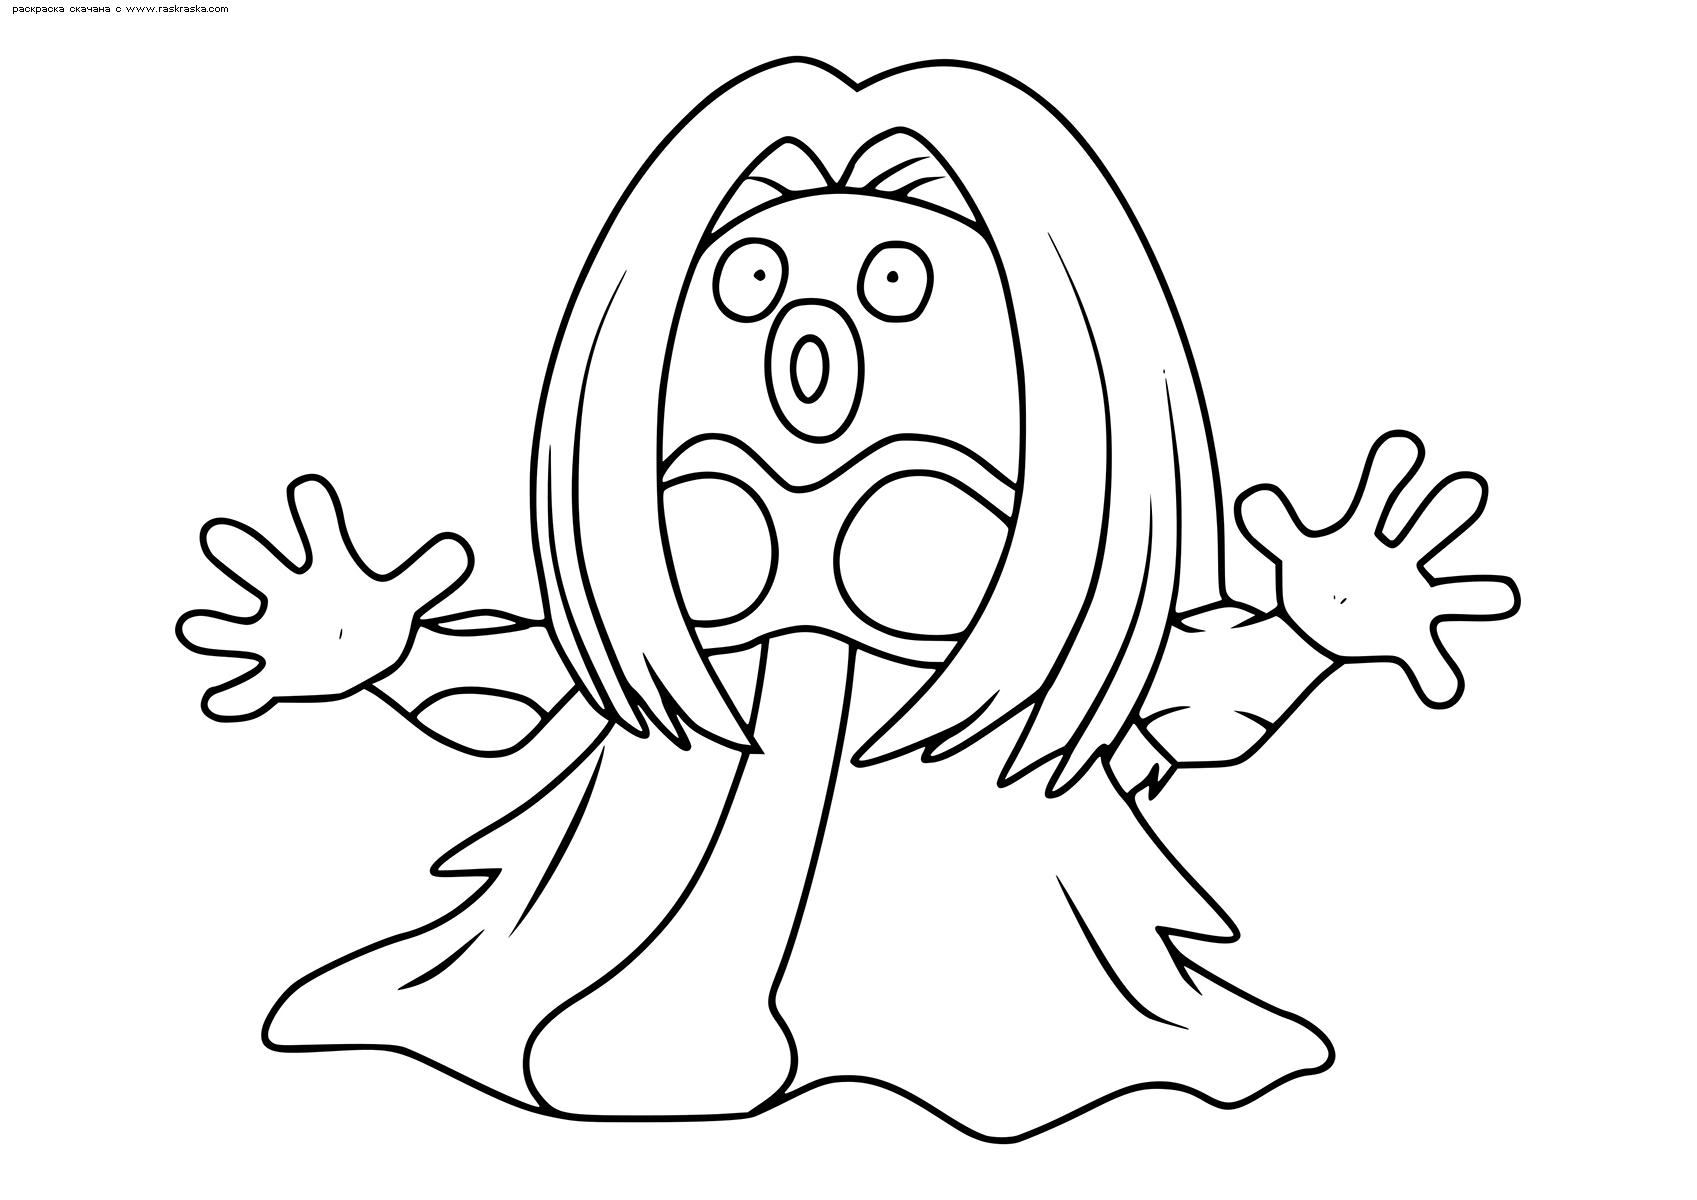 Раскраска Покемон Джинкс (Jynx) | Раскраски эволюция ...